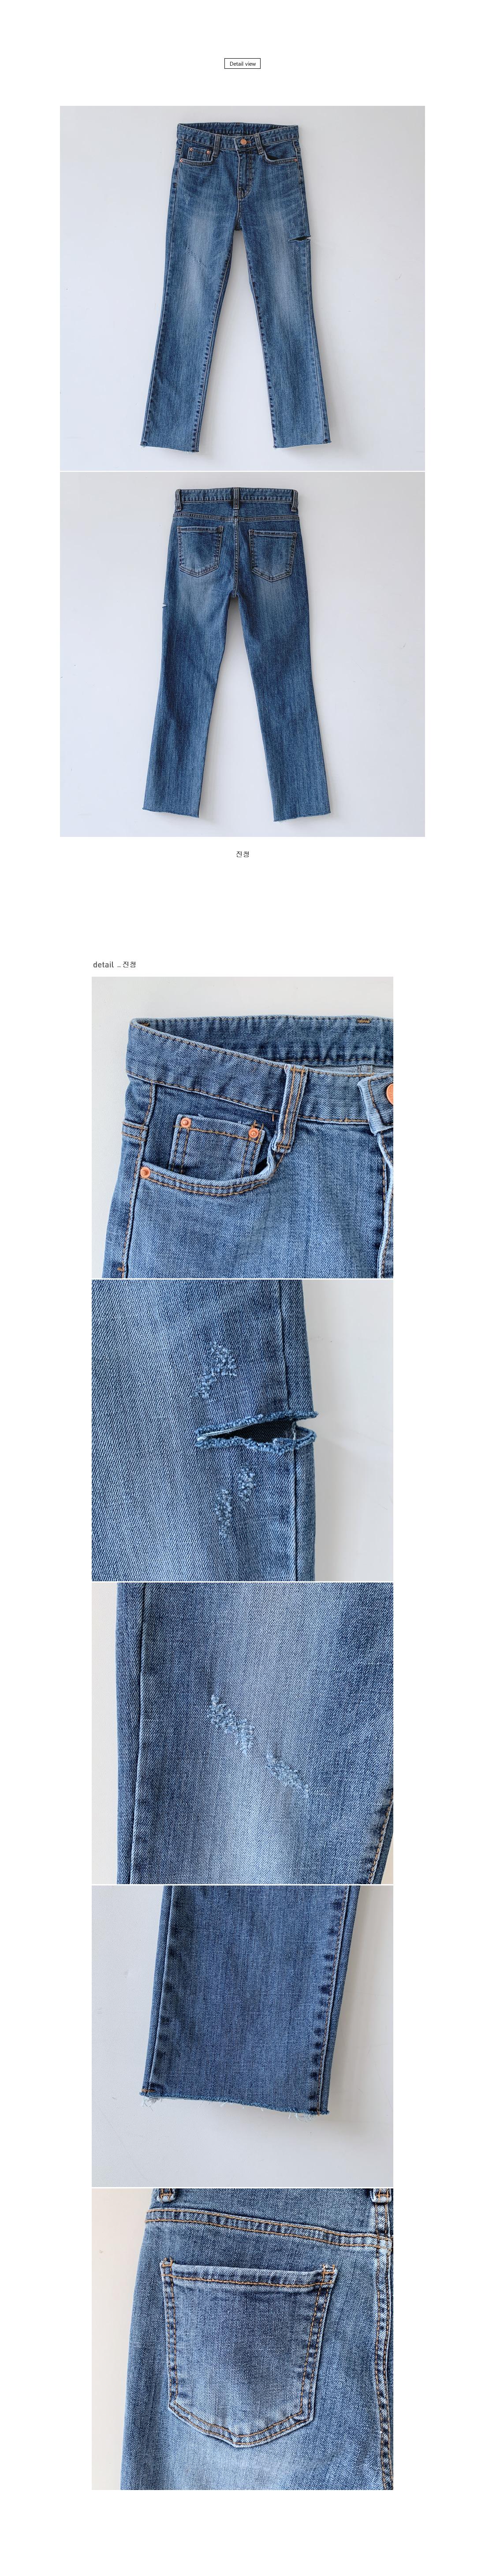 Nicky Bottom Slim Date Pants